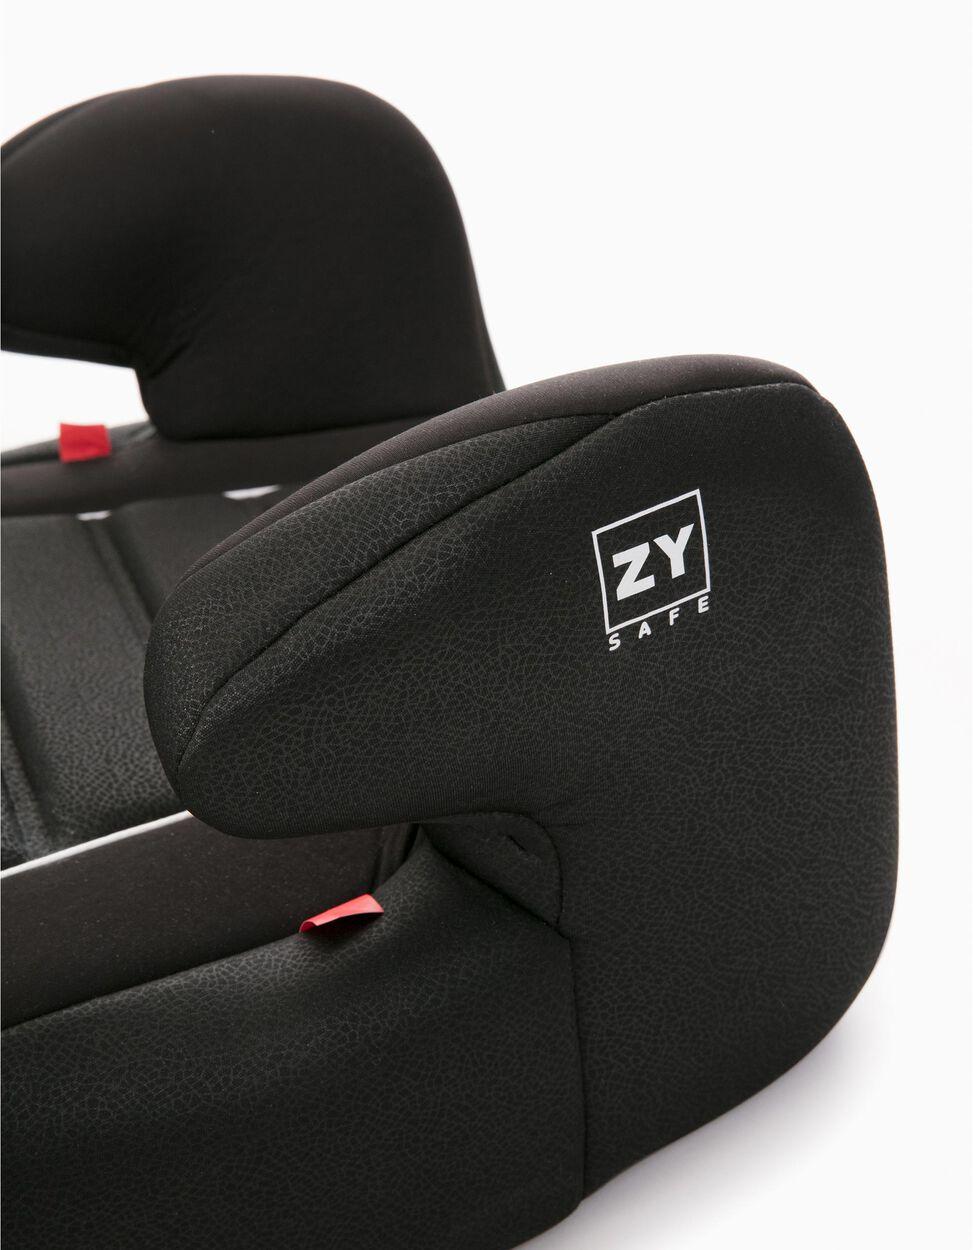 Assento Auto Elevatório Primecare Prestige Zy Safe Black